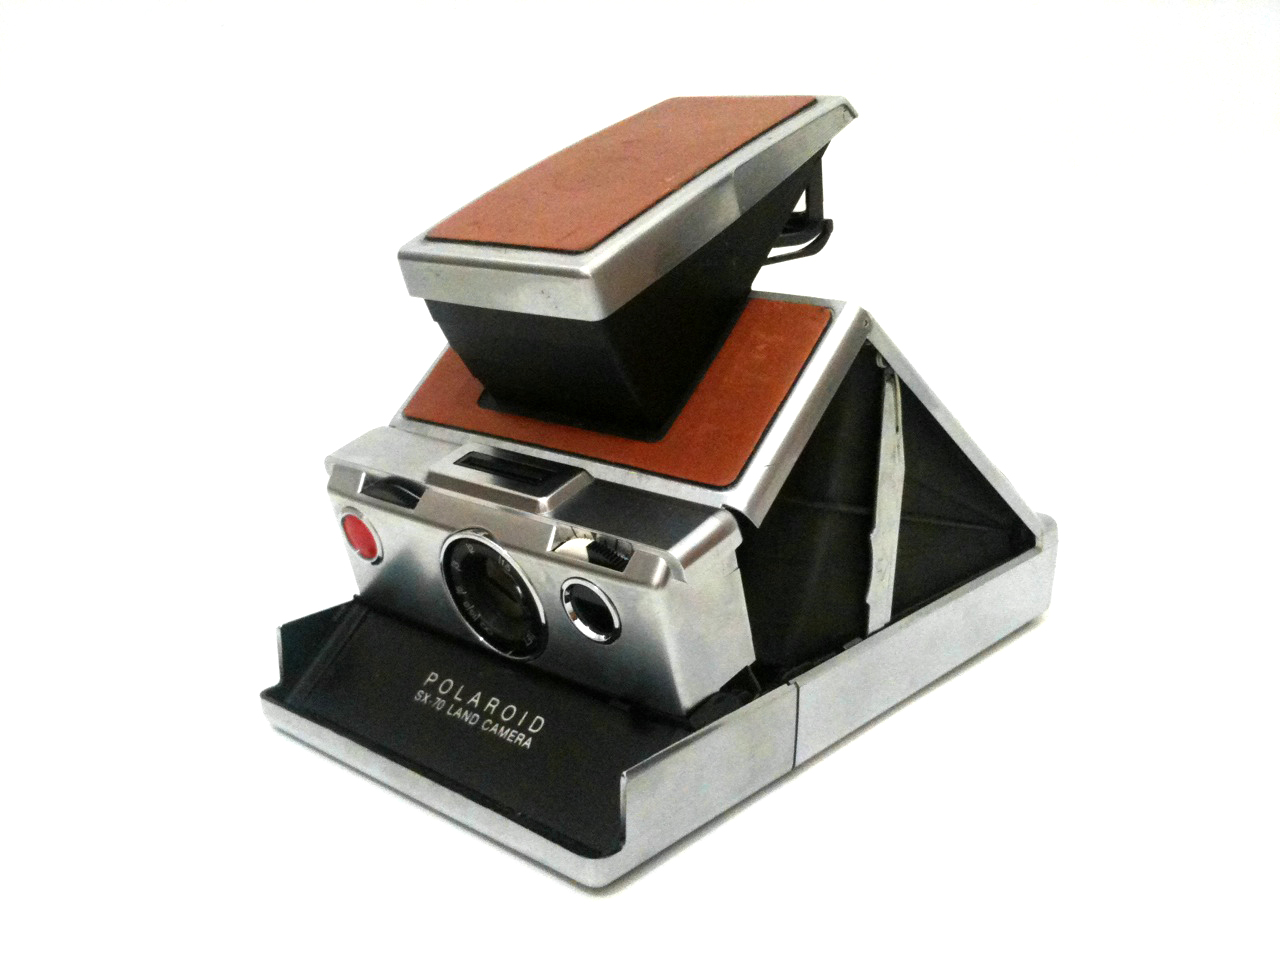 Cool classic…the Polaroid SX-70 land camera